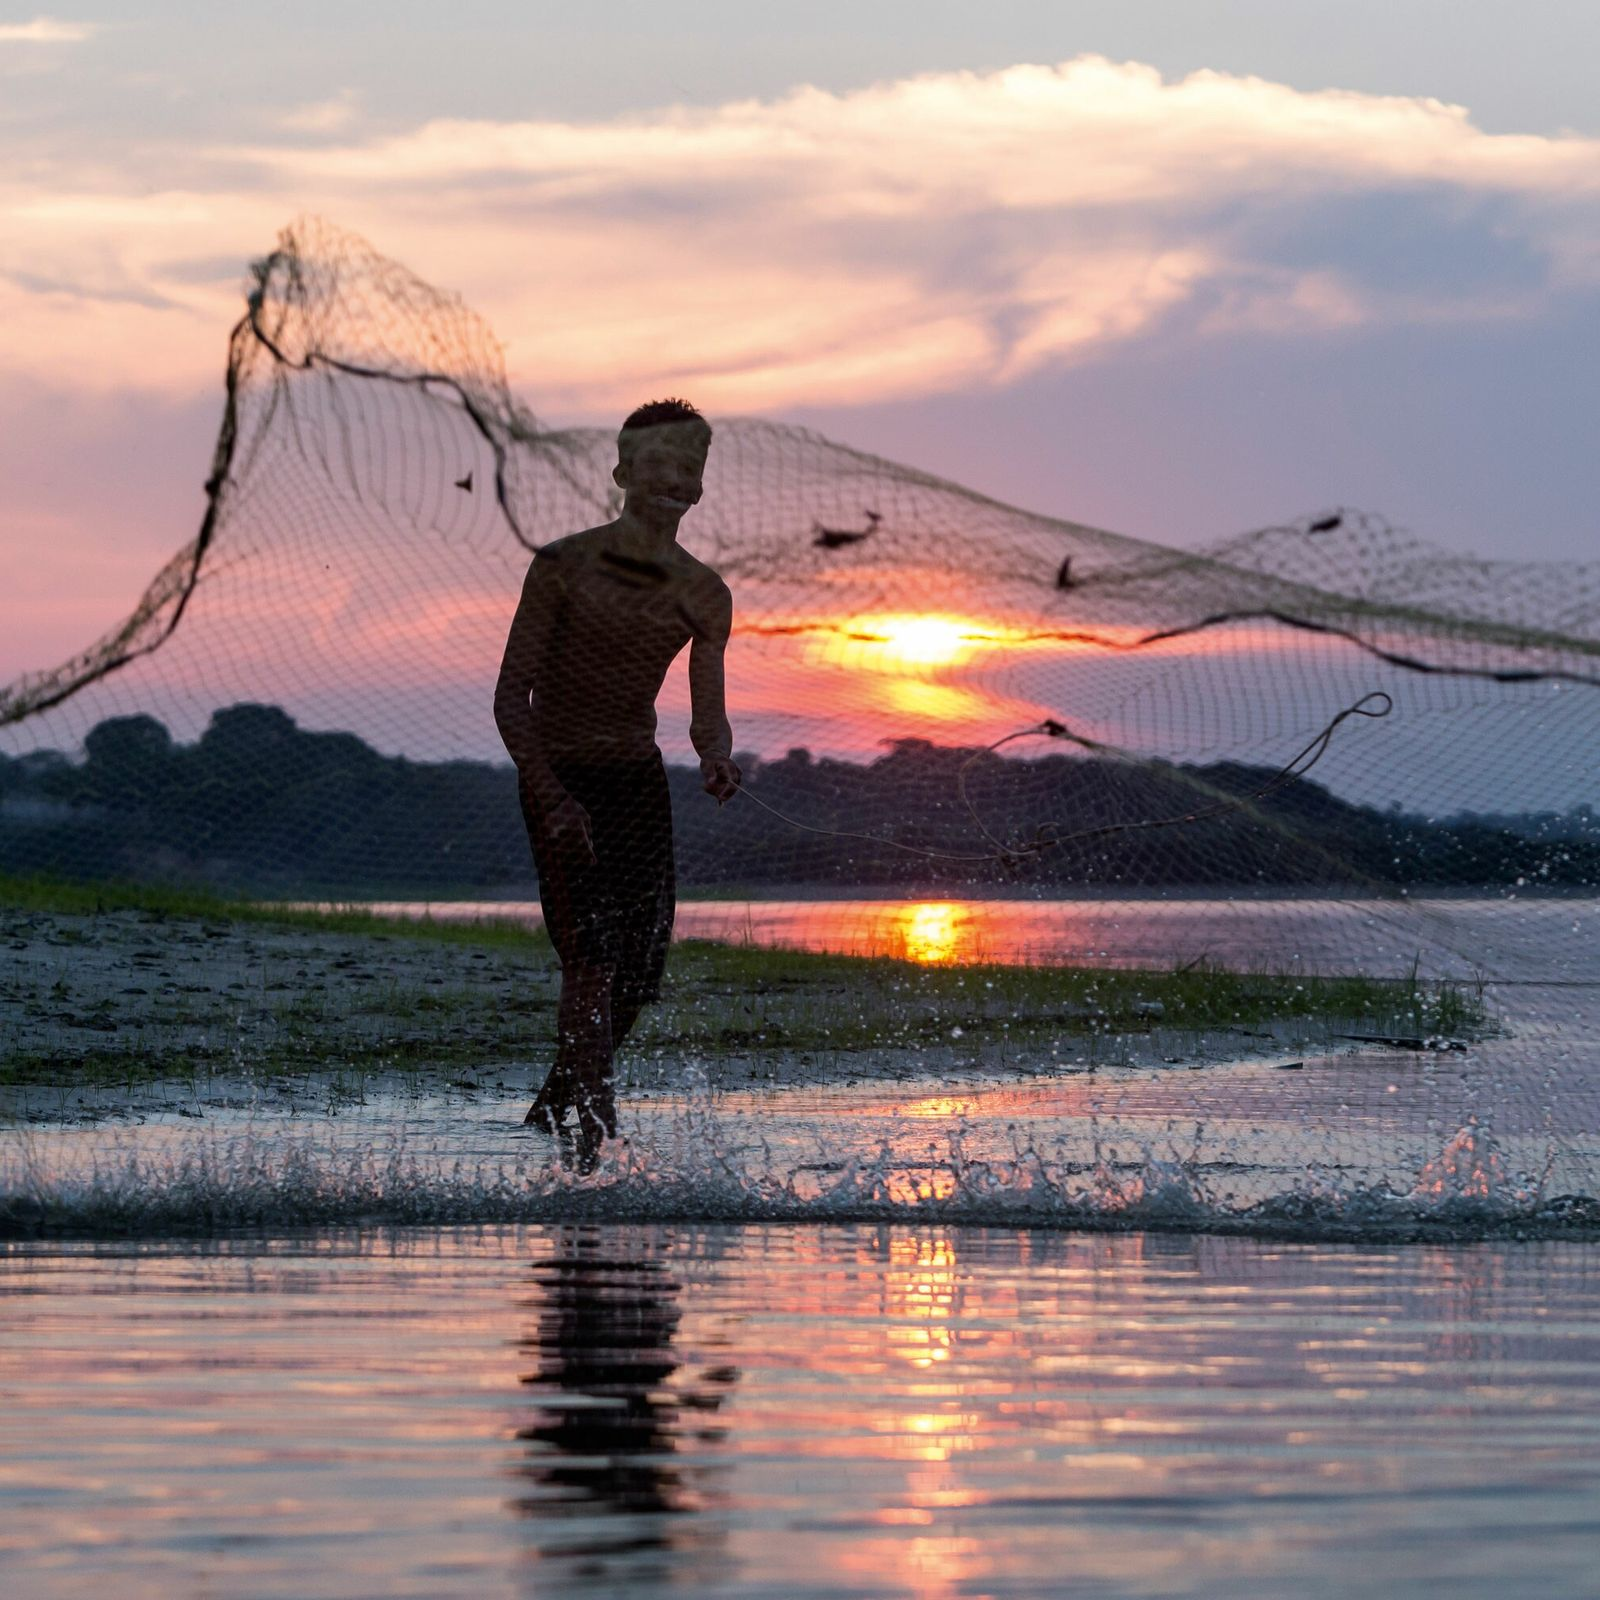 A fisherman casts his net into the Rio Negro, Brazil.